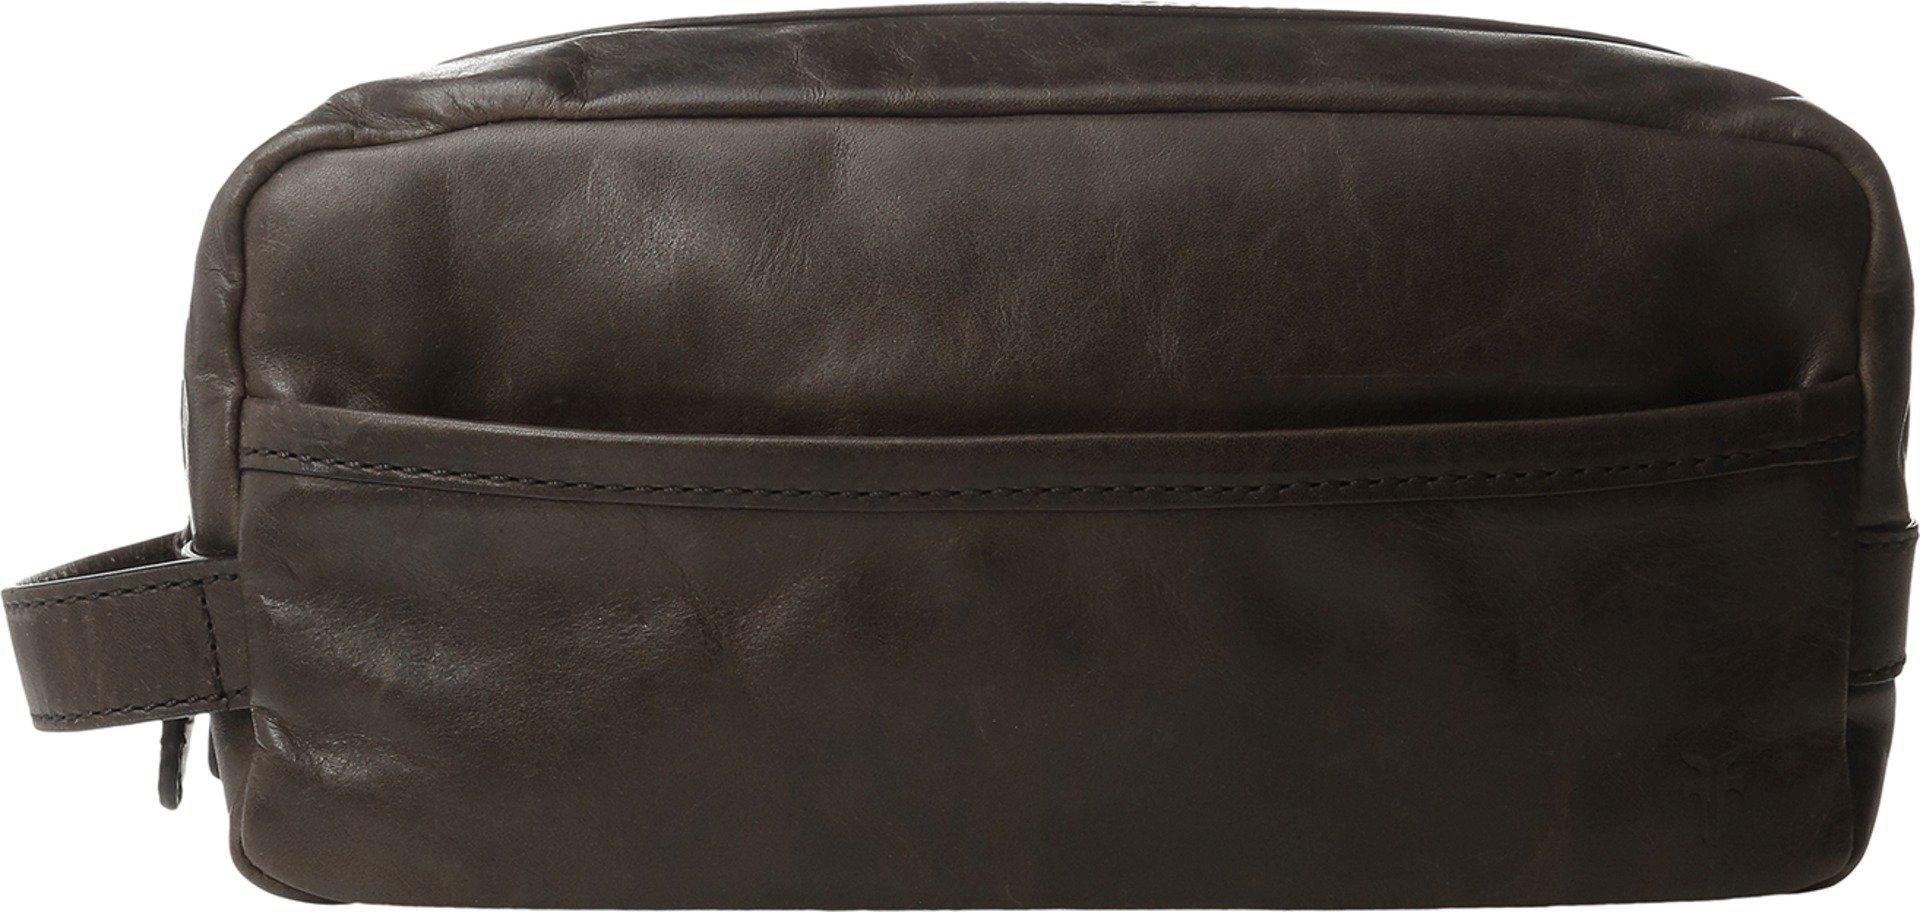 FRYE Men's Logan Large Travel Dopp Kit, Slate, One Size